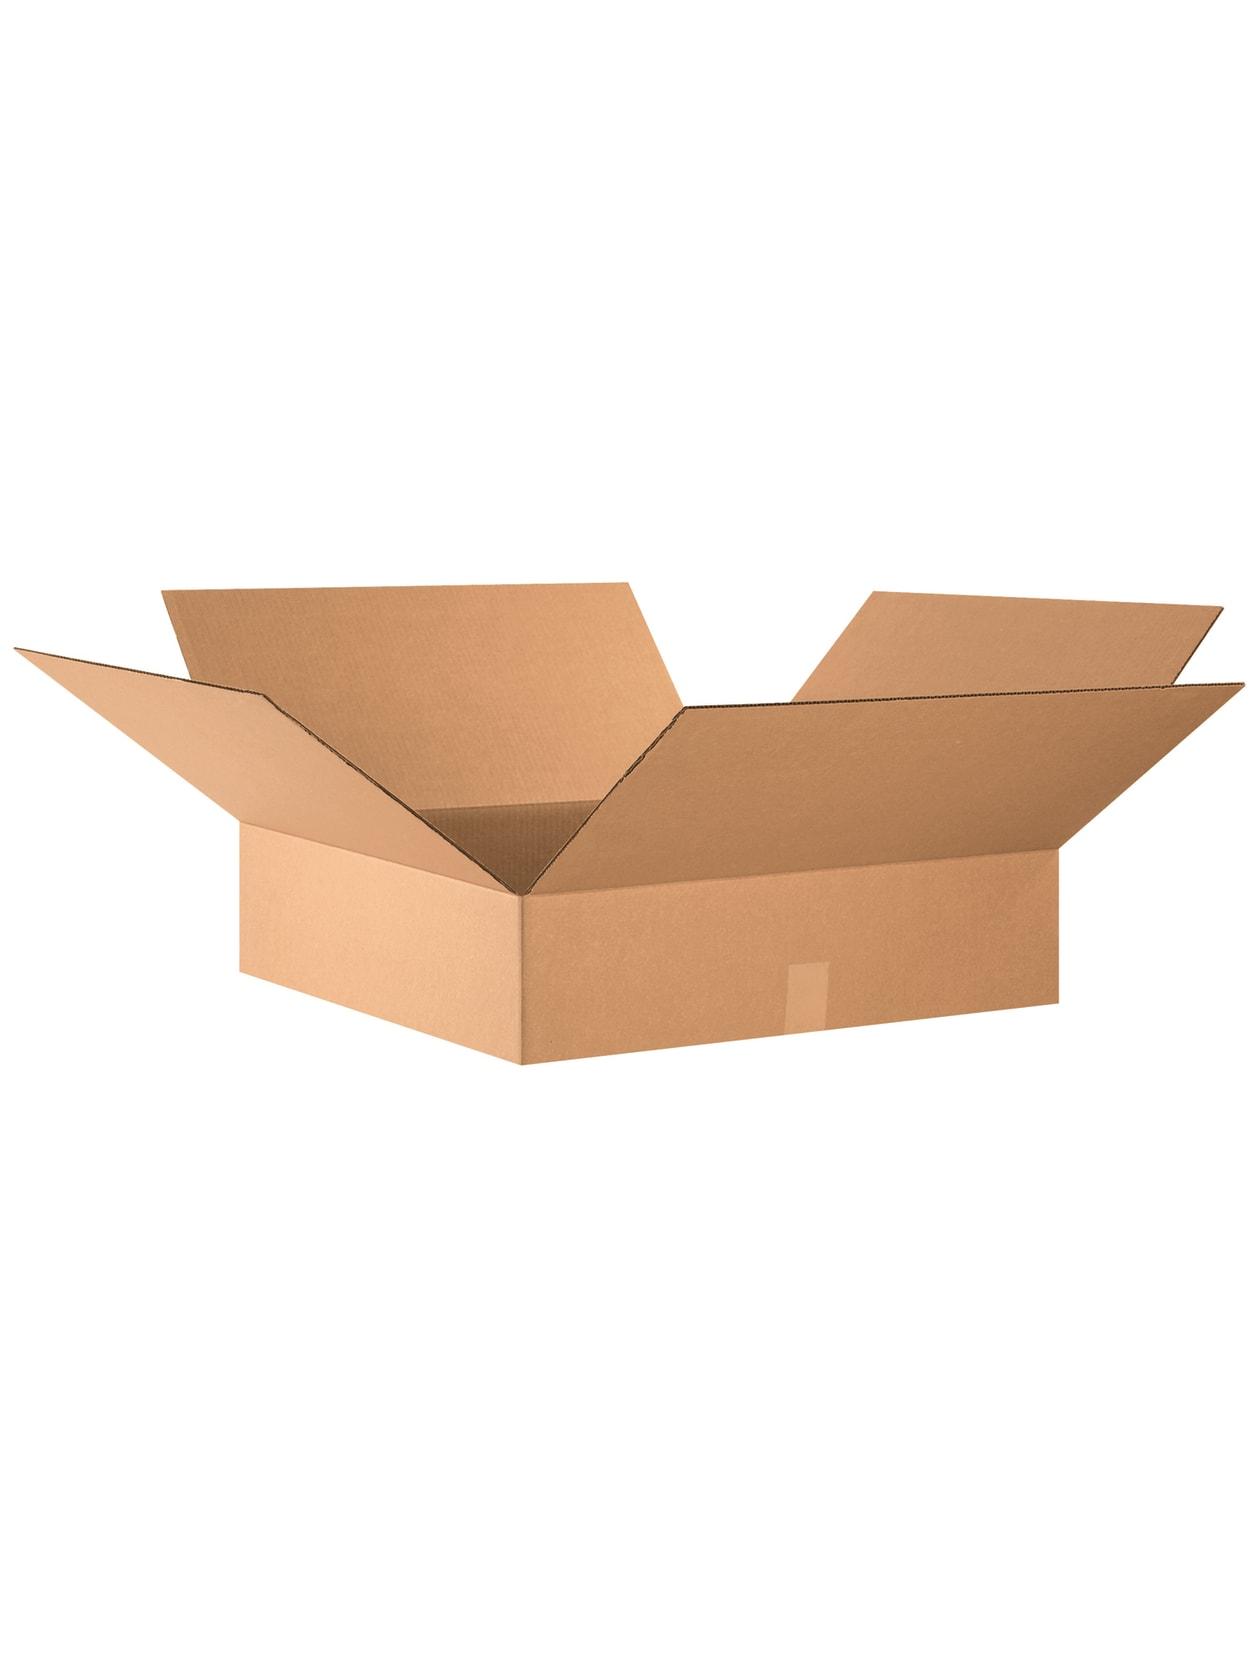 20 Pieces Kraft Shipping Carton 24 Inside L